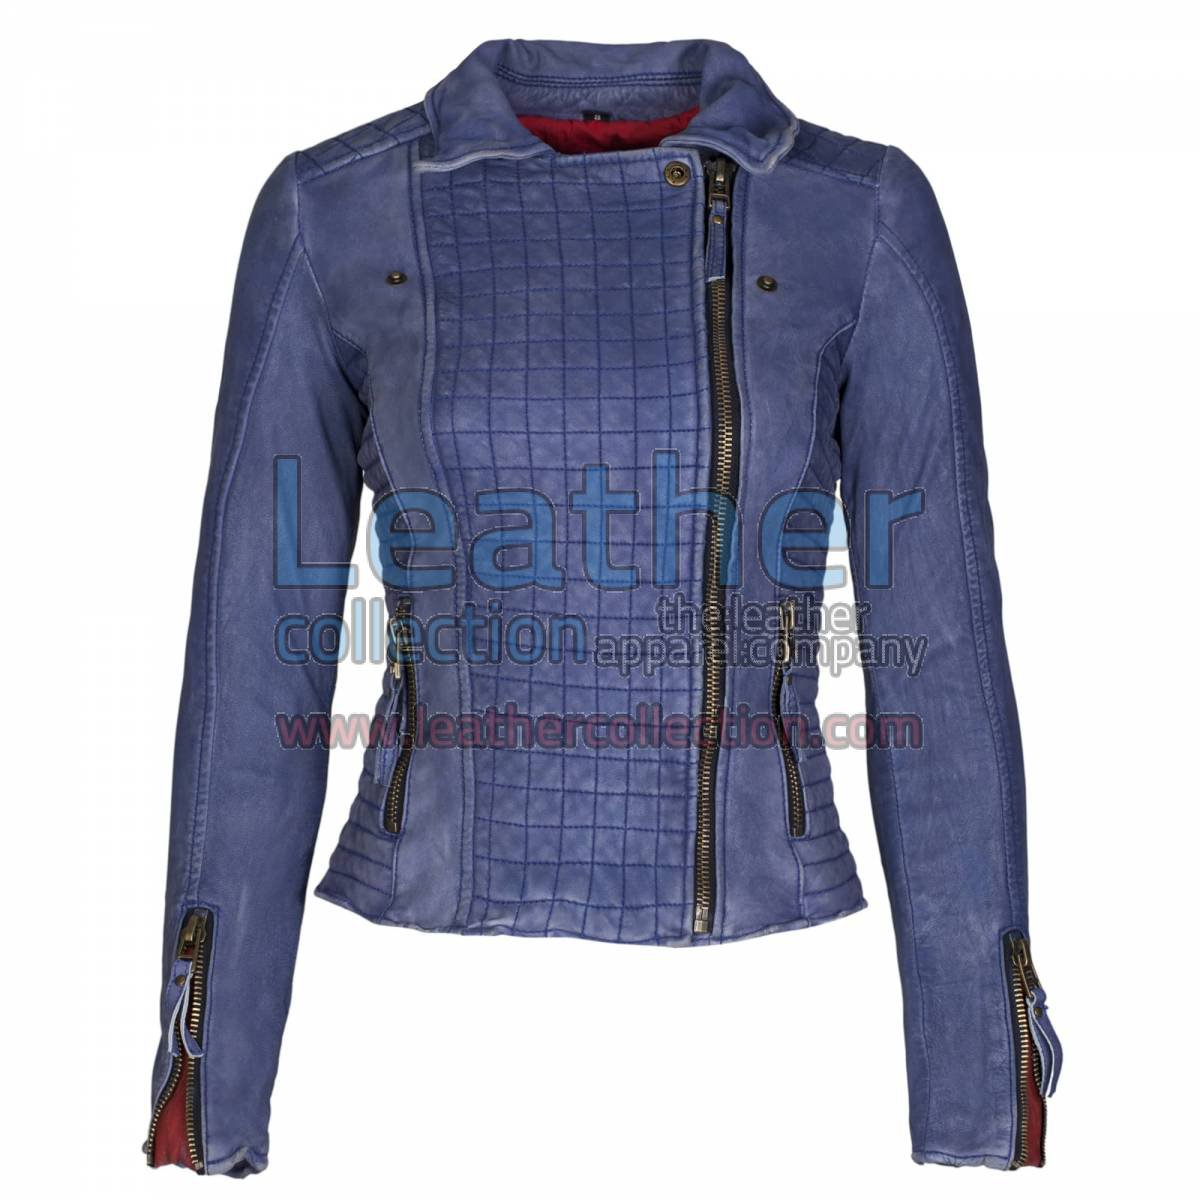 Heritage Ladies Blue Fashion Leather Jacket